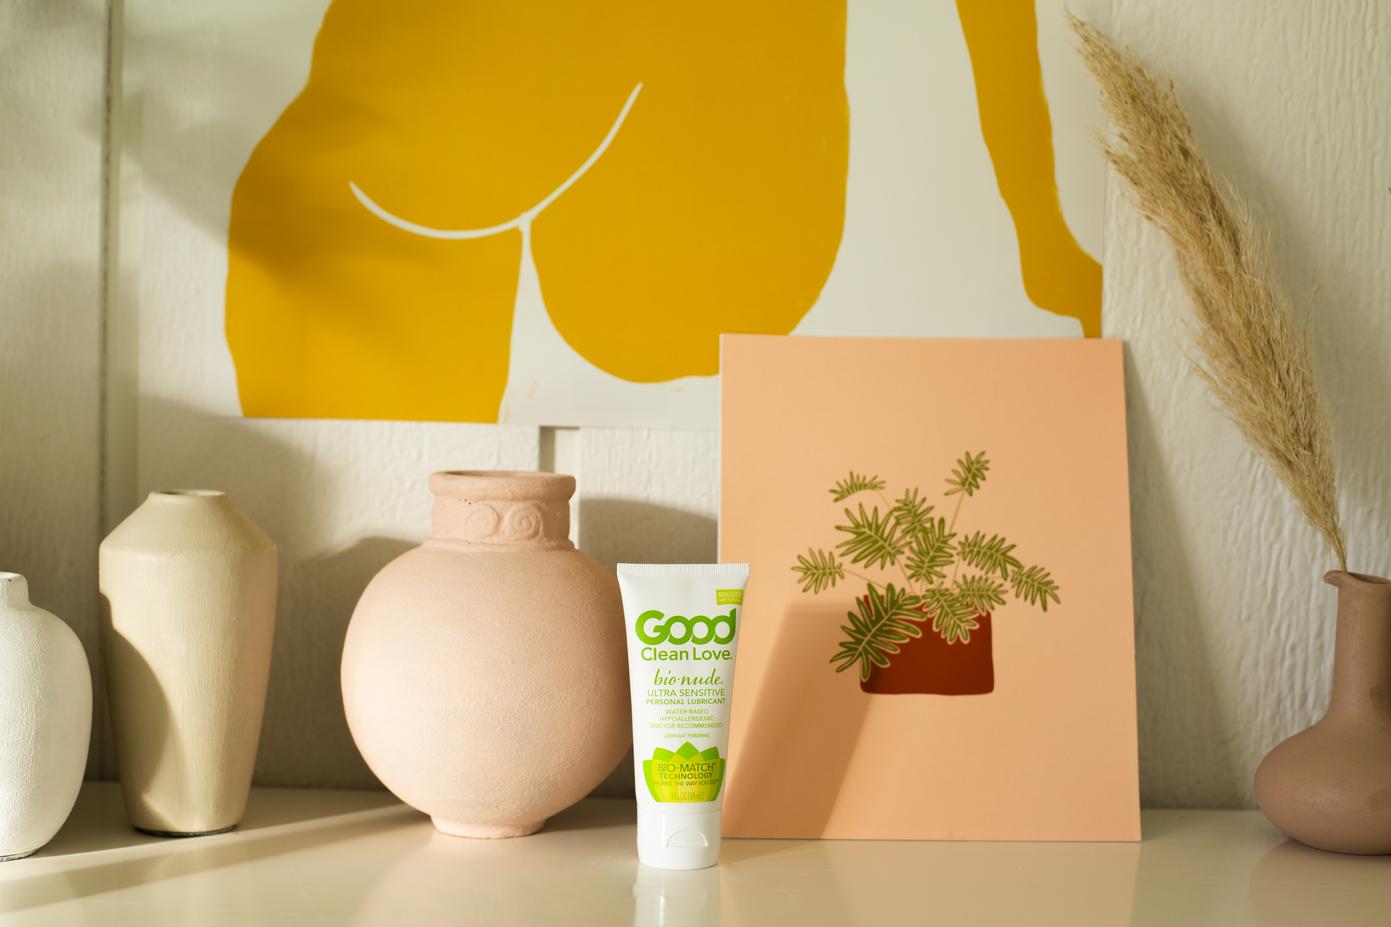 gooc-clean-love-bionude-lubrikacni-gel